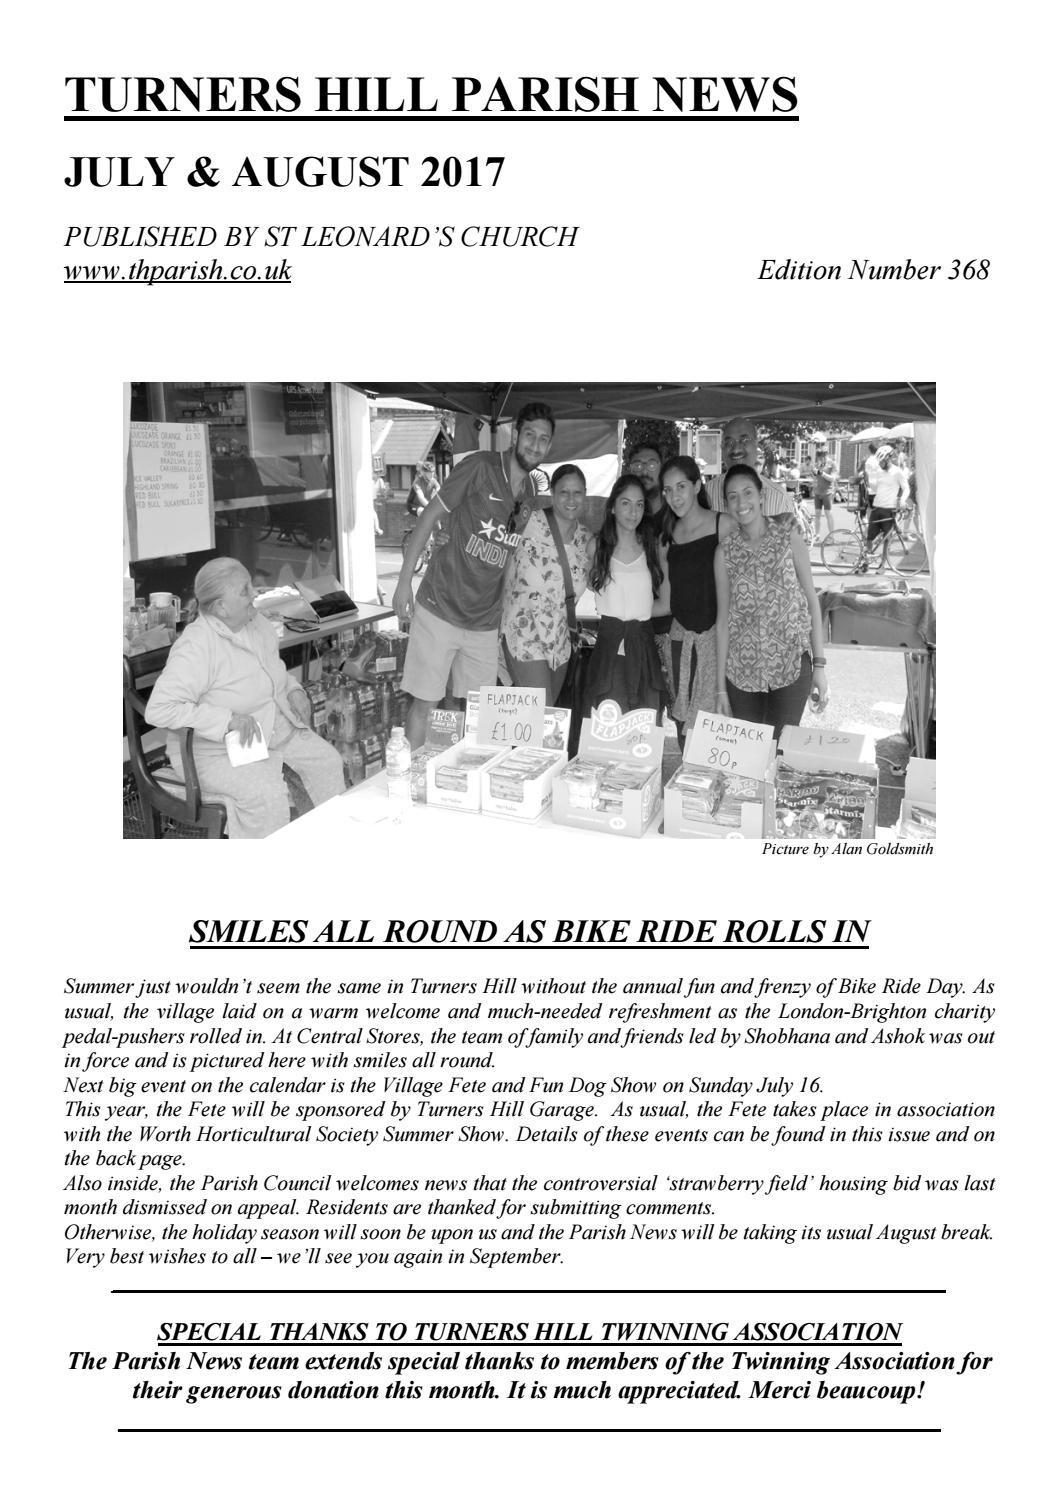 Parish News Summer 2017 By St Leonards Turners Hill